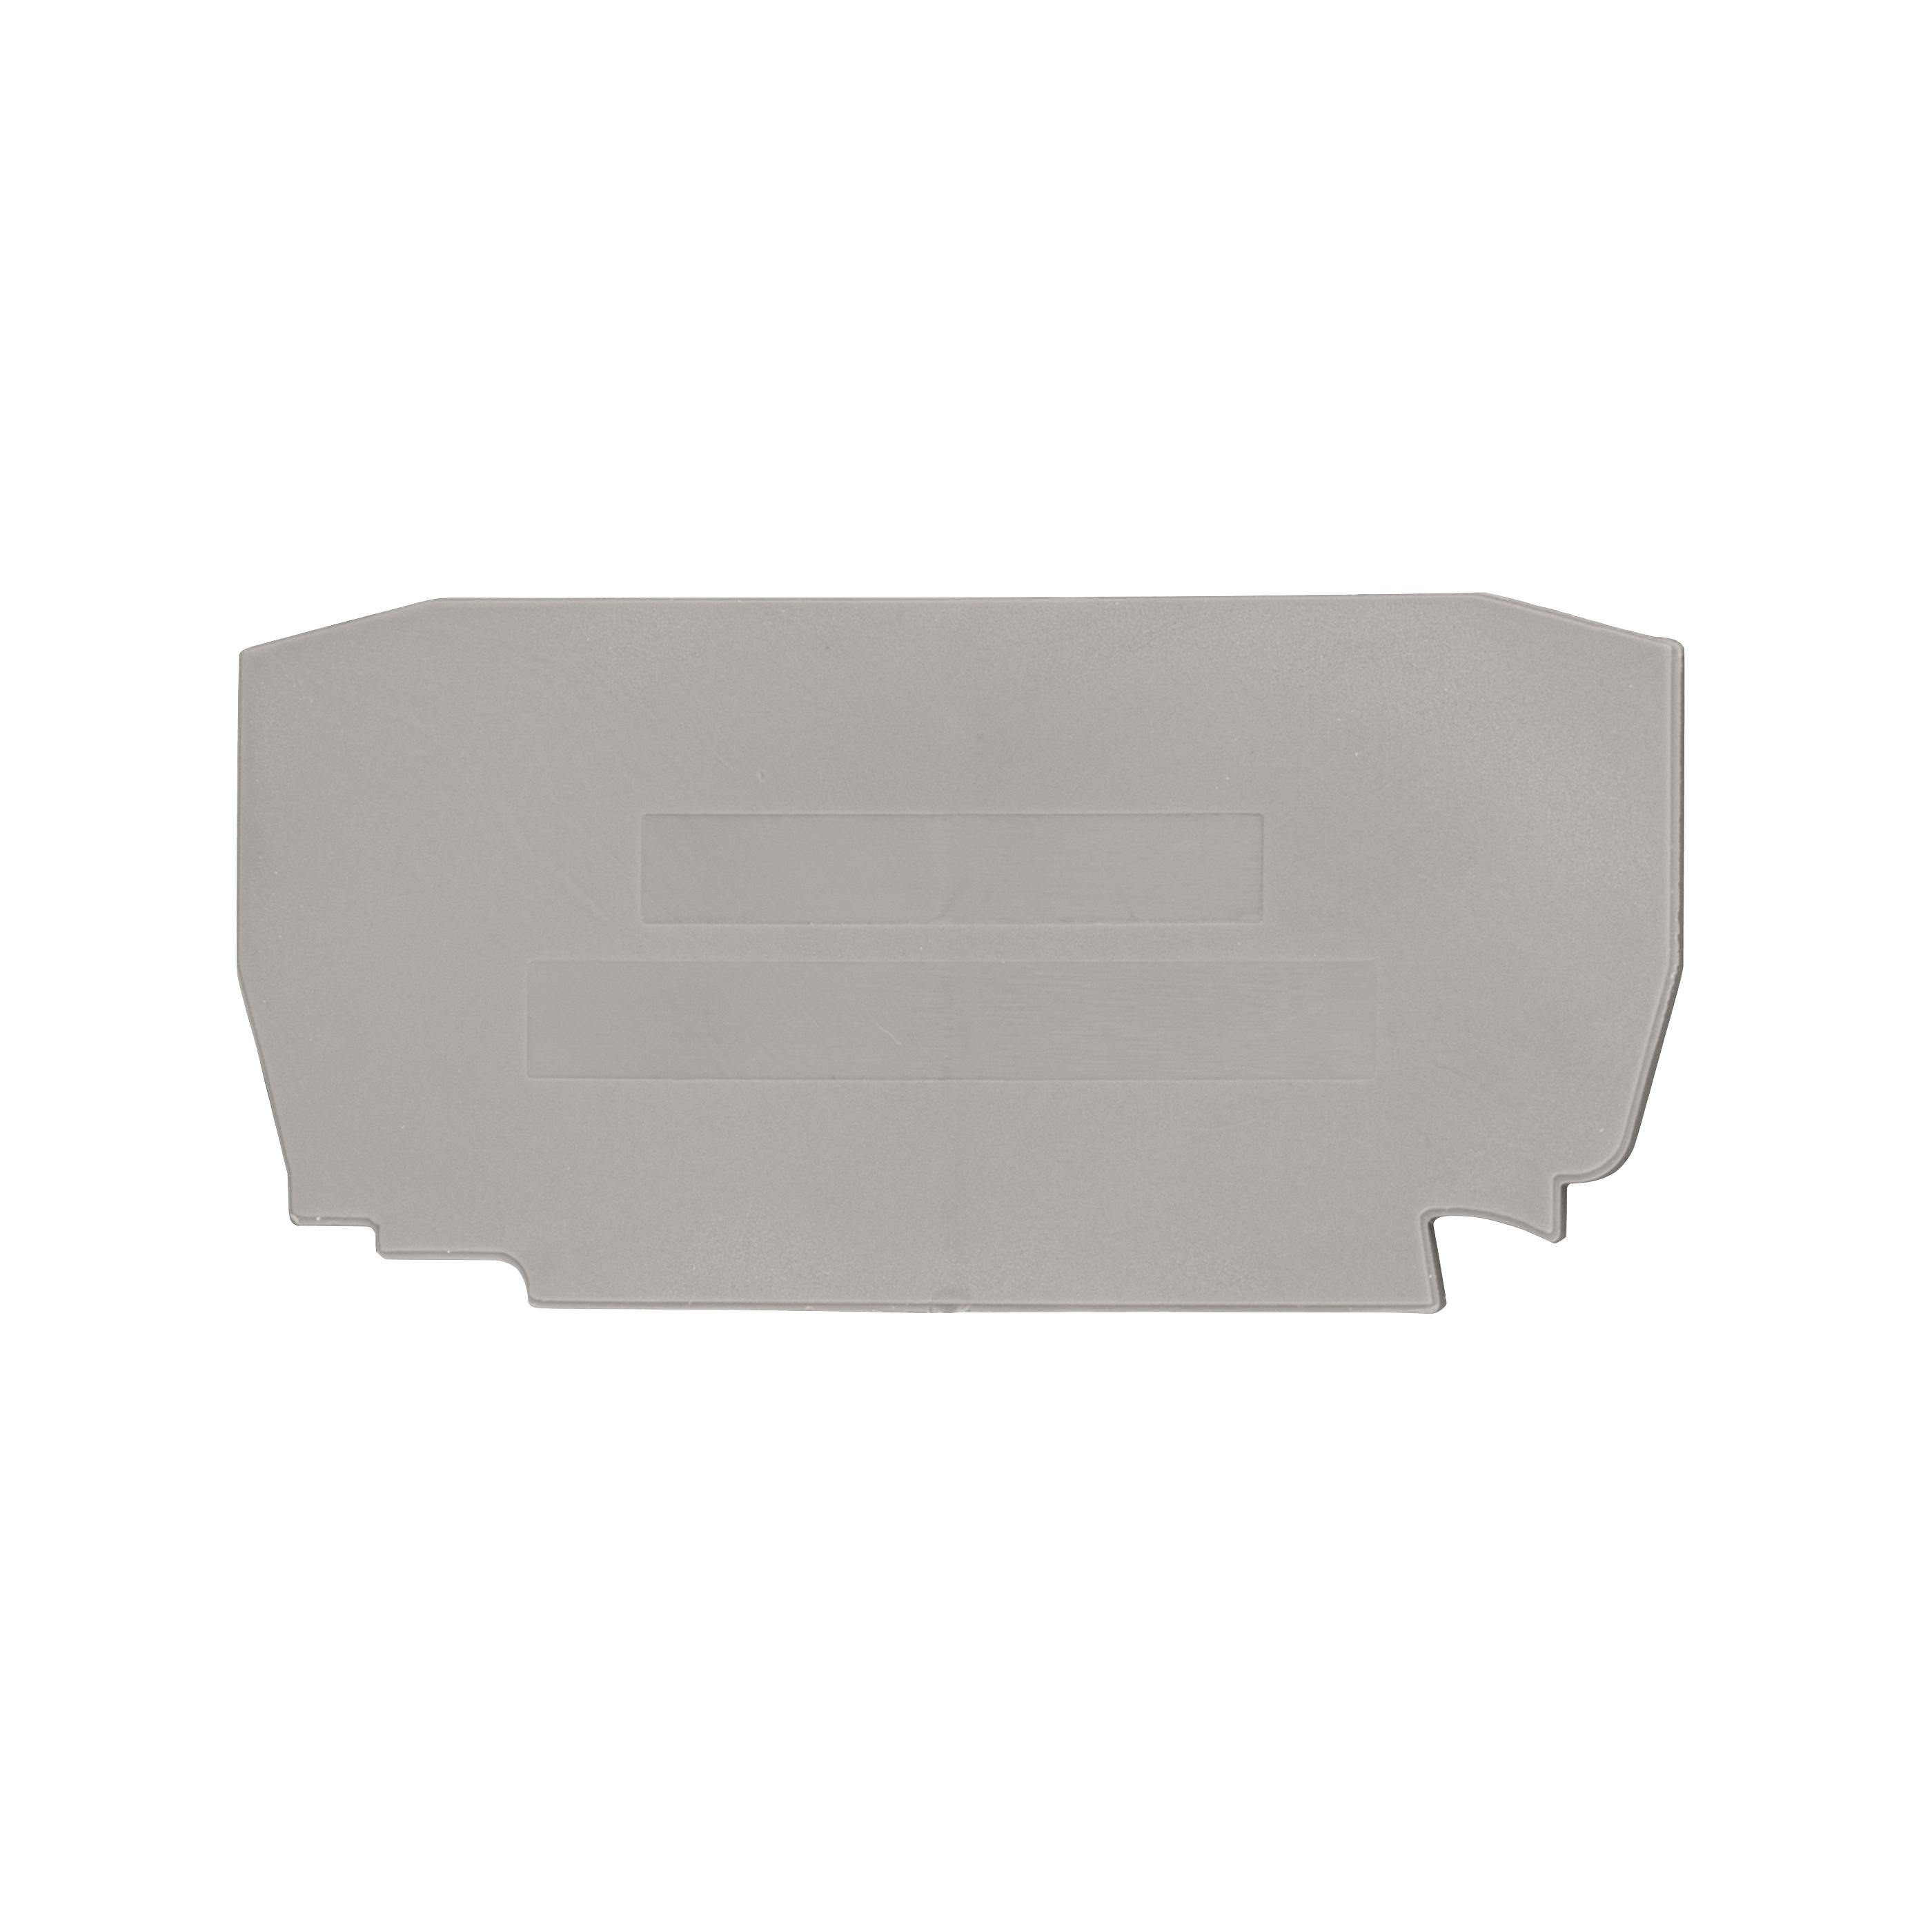 1 Stk Endplatte für Federkraftklemme YBK 2.5 grau IK610202--